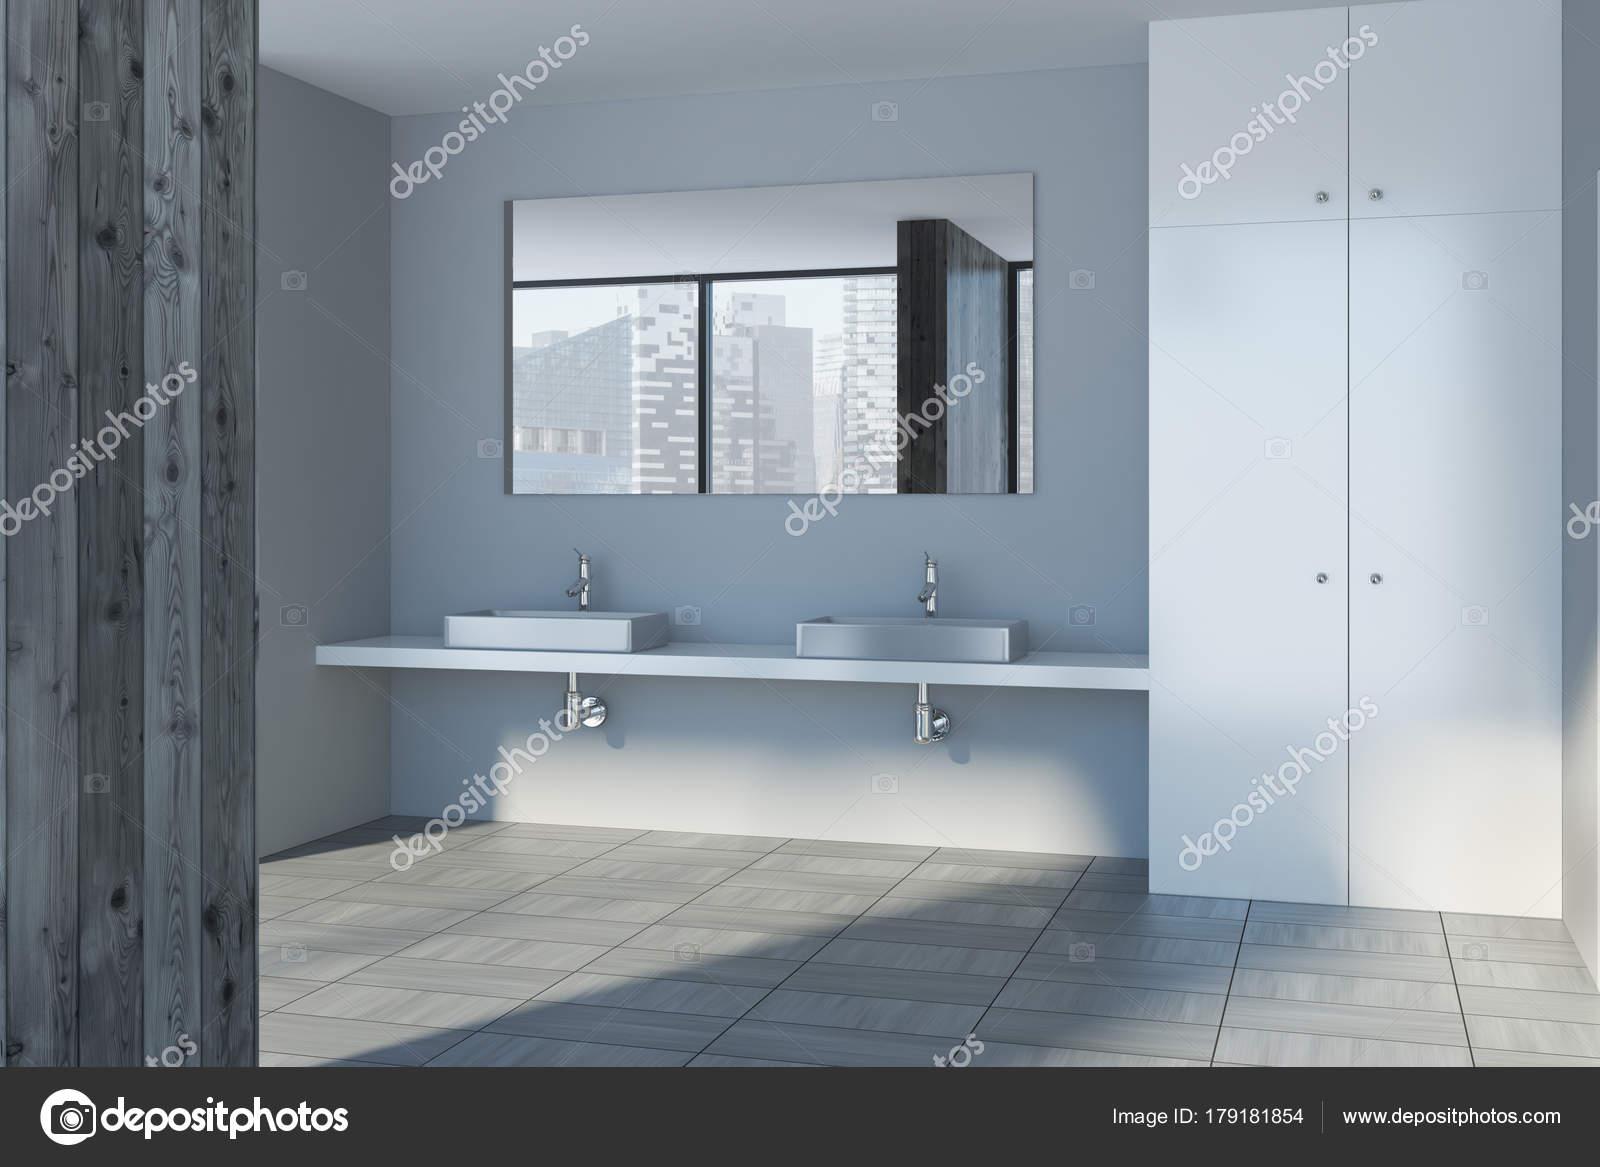 https://st3.depositphotos.com/2673929/17918/i/1600/depositphotos_179181854-stockafbeelding-houten-badkamer-interieur-dubbele-wastafel.jpg